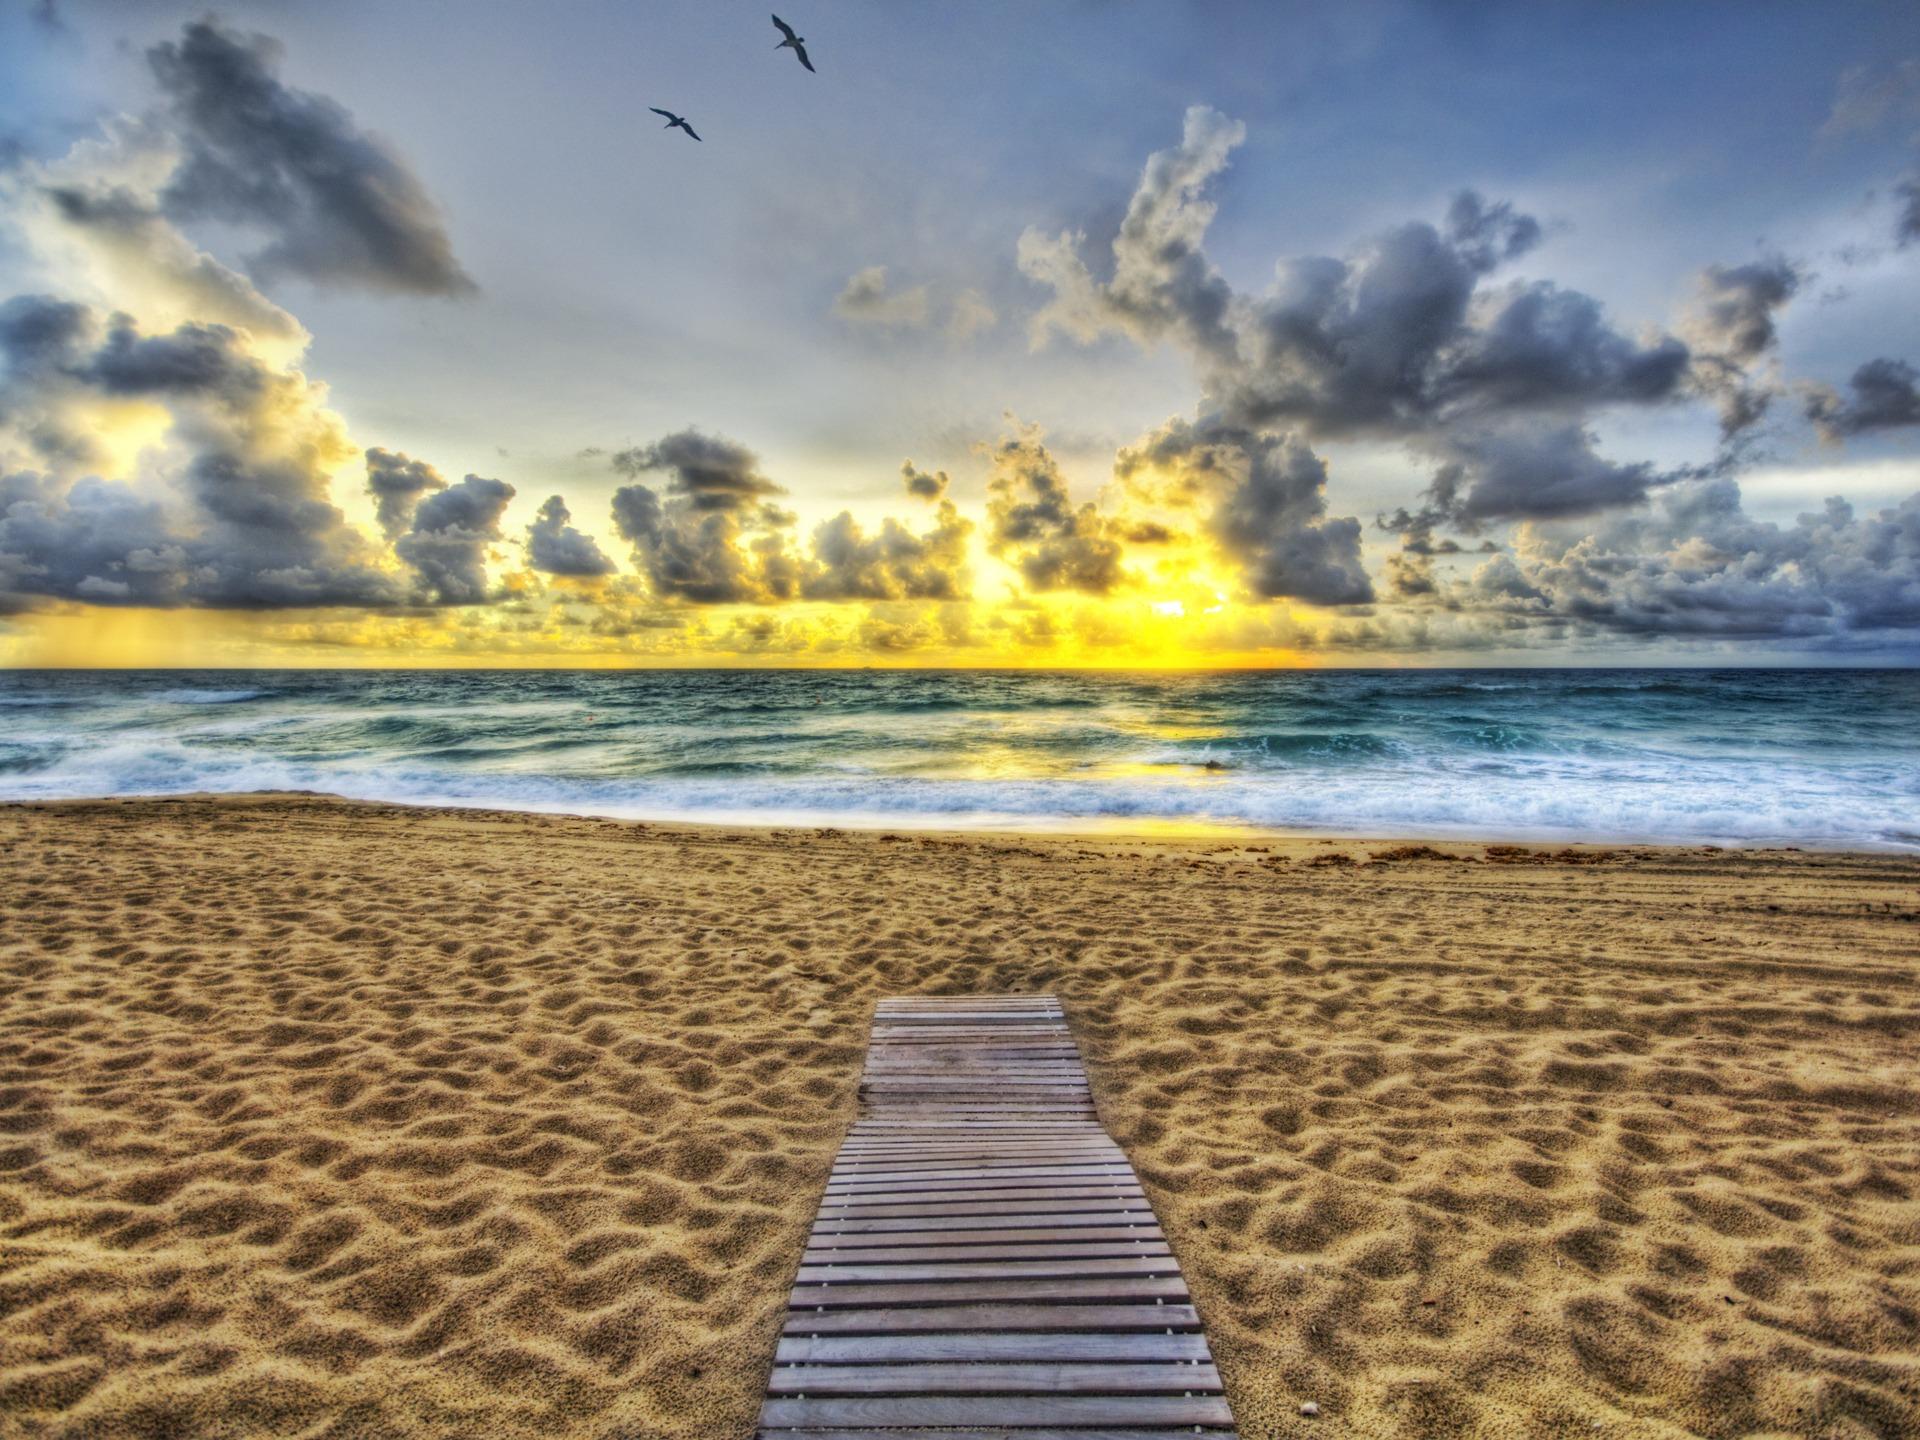 Ocean Sunset Wallpaper Beaches Nature Wallpapers In Jpg Format For